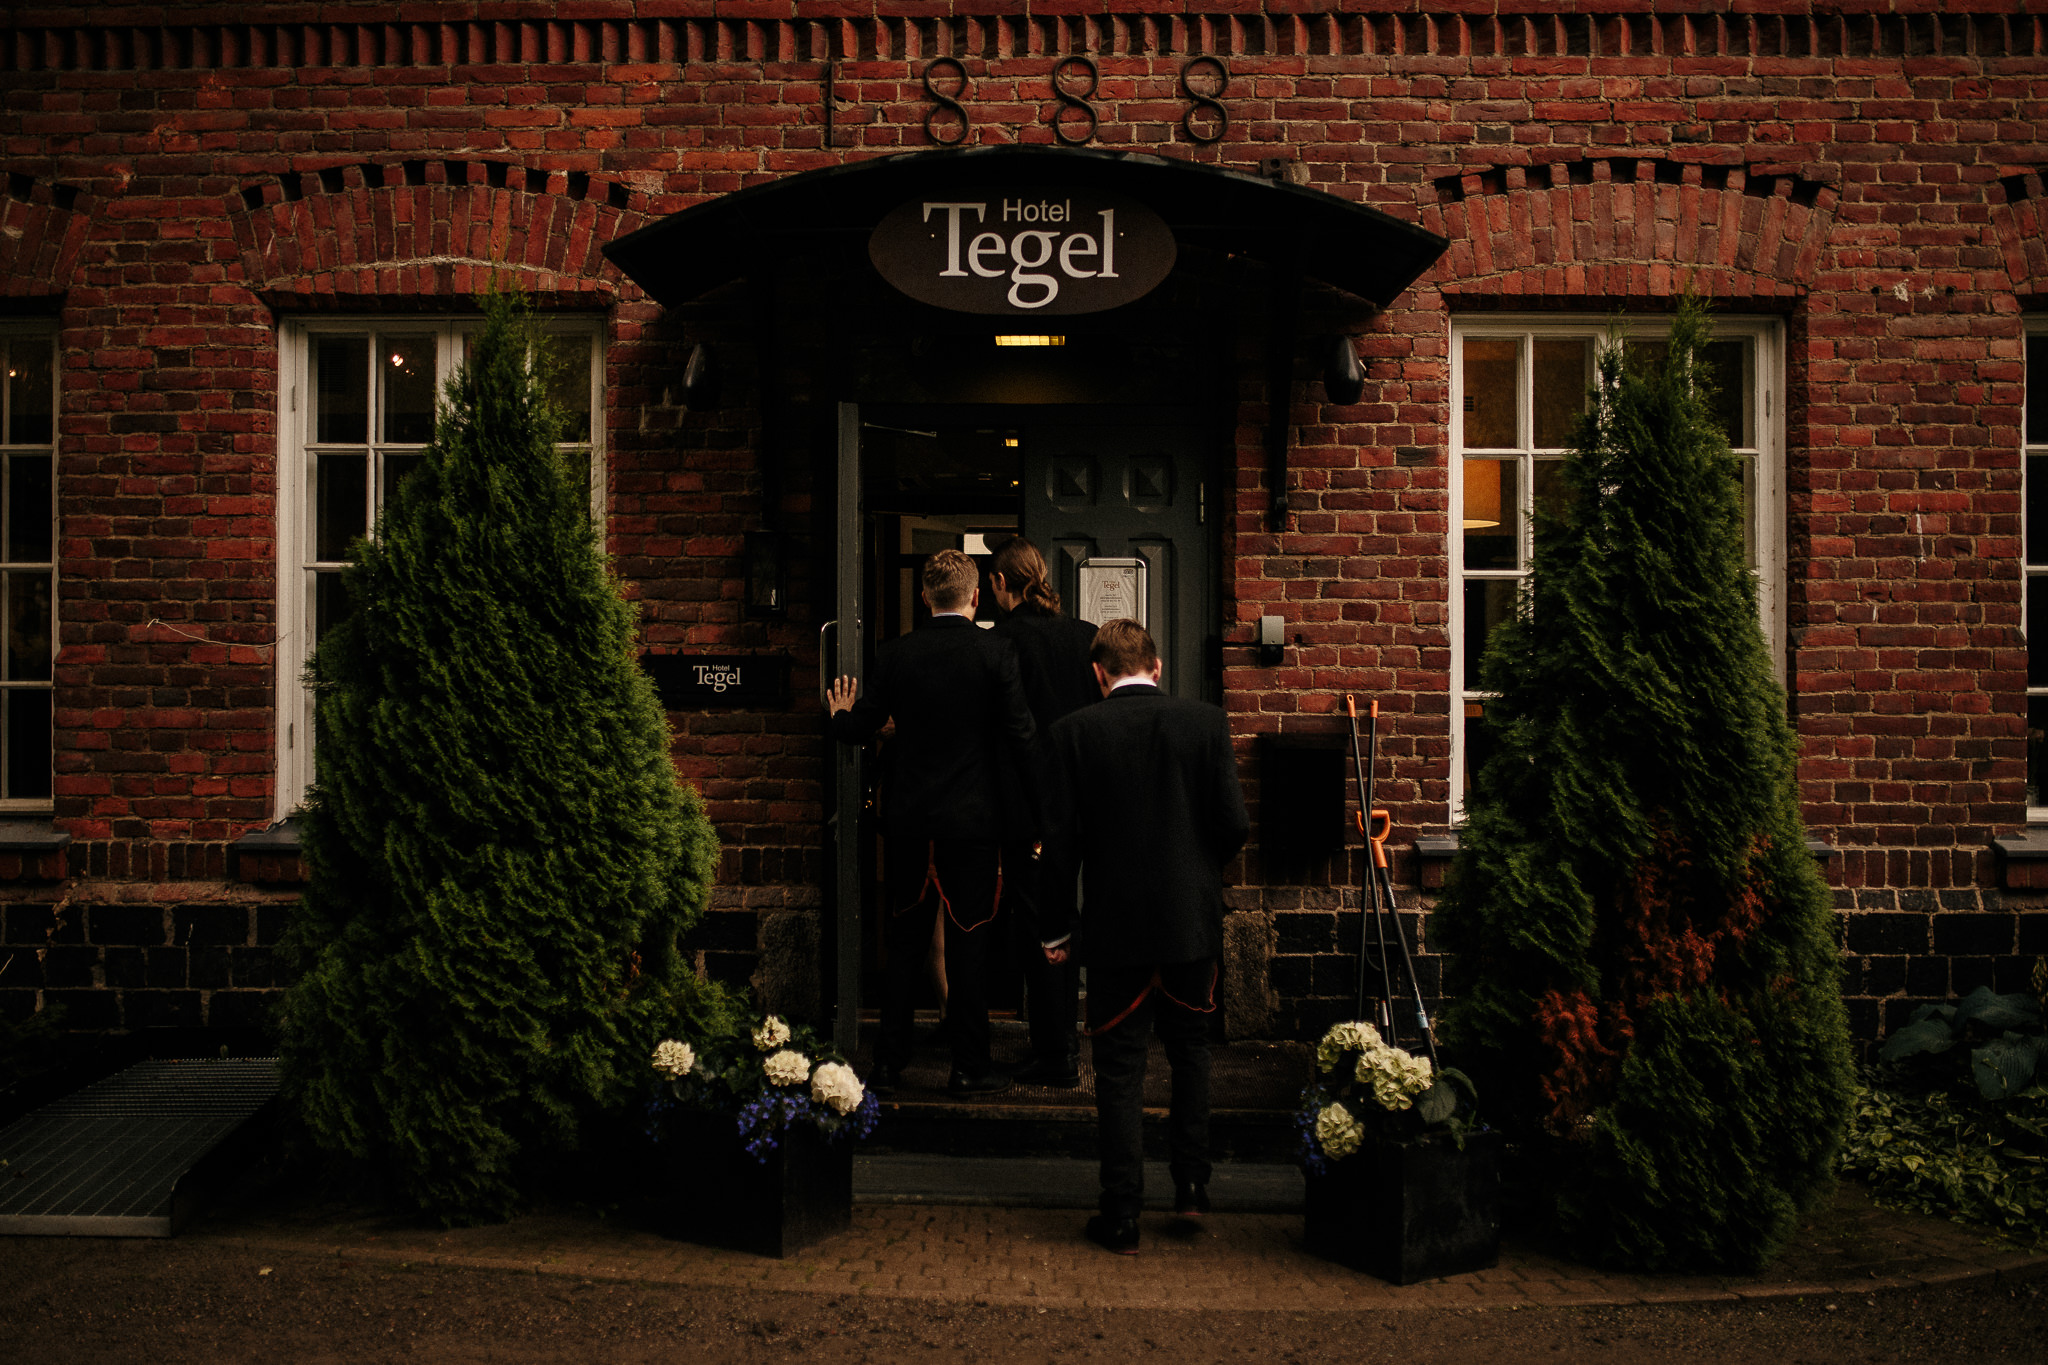 Ceren & Jani - Finland Wedding Photographer - Weddings by Qay - Wedding Photographer (20 of 166).jpg